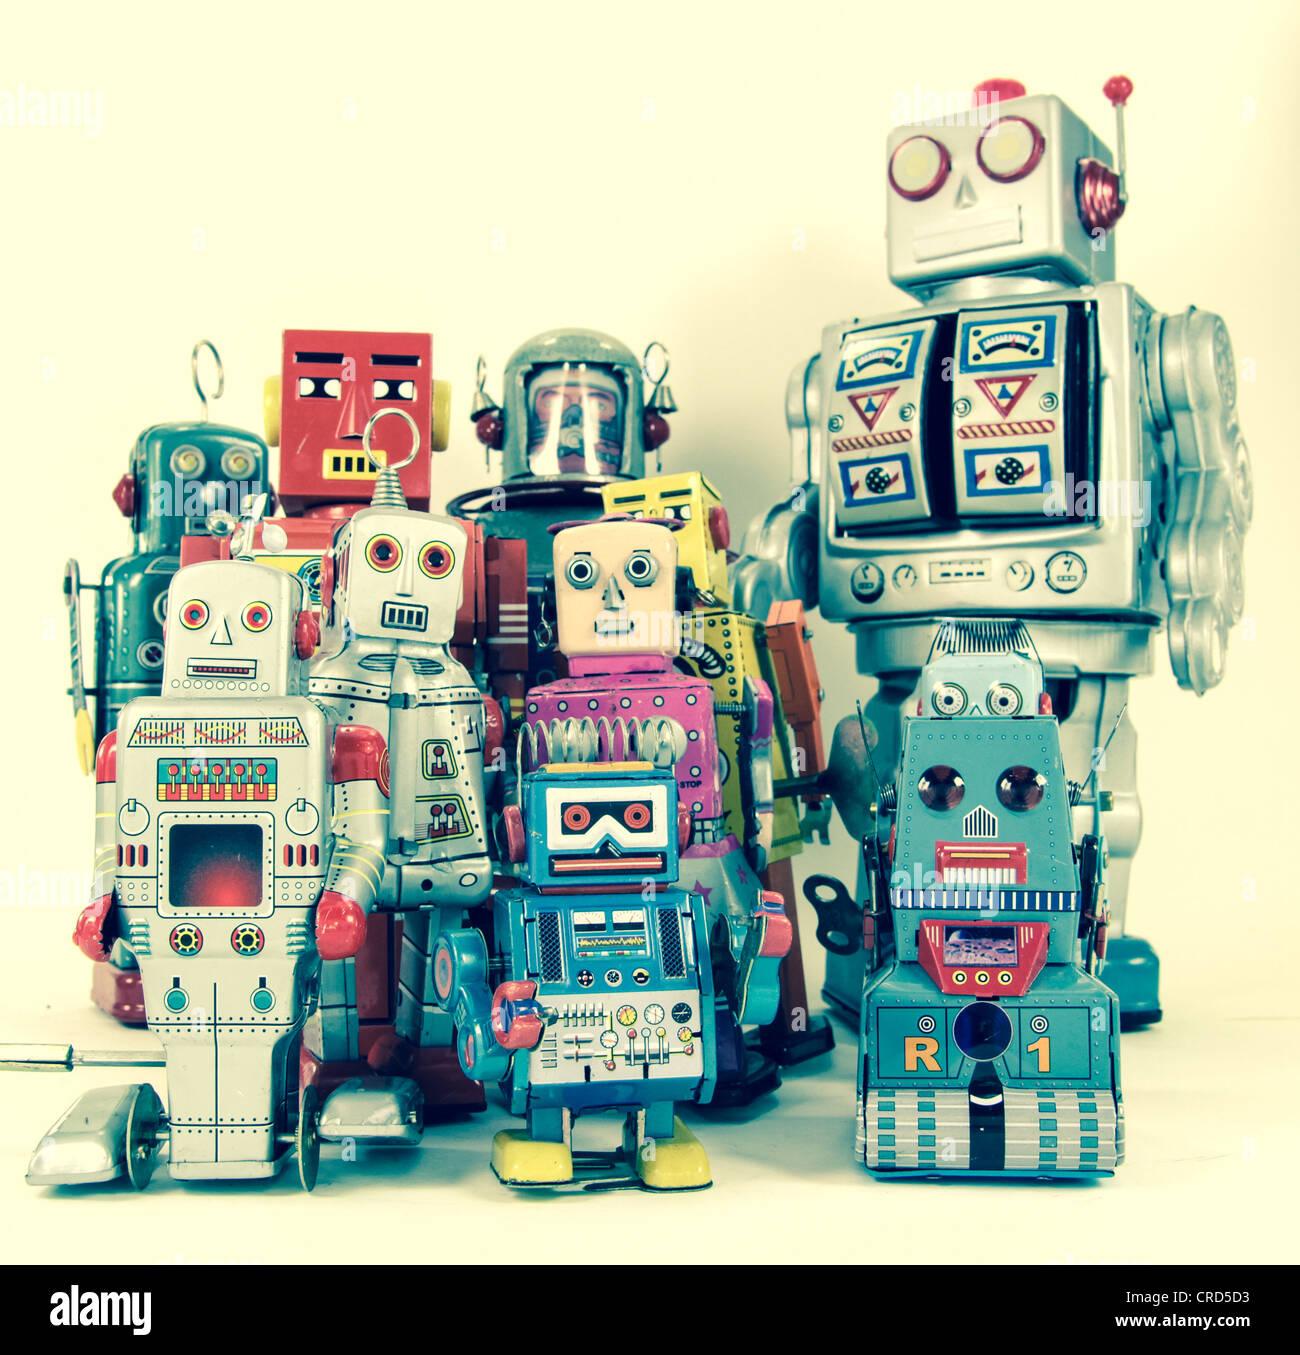 un robot jouet Photo Stock